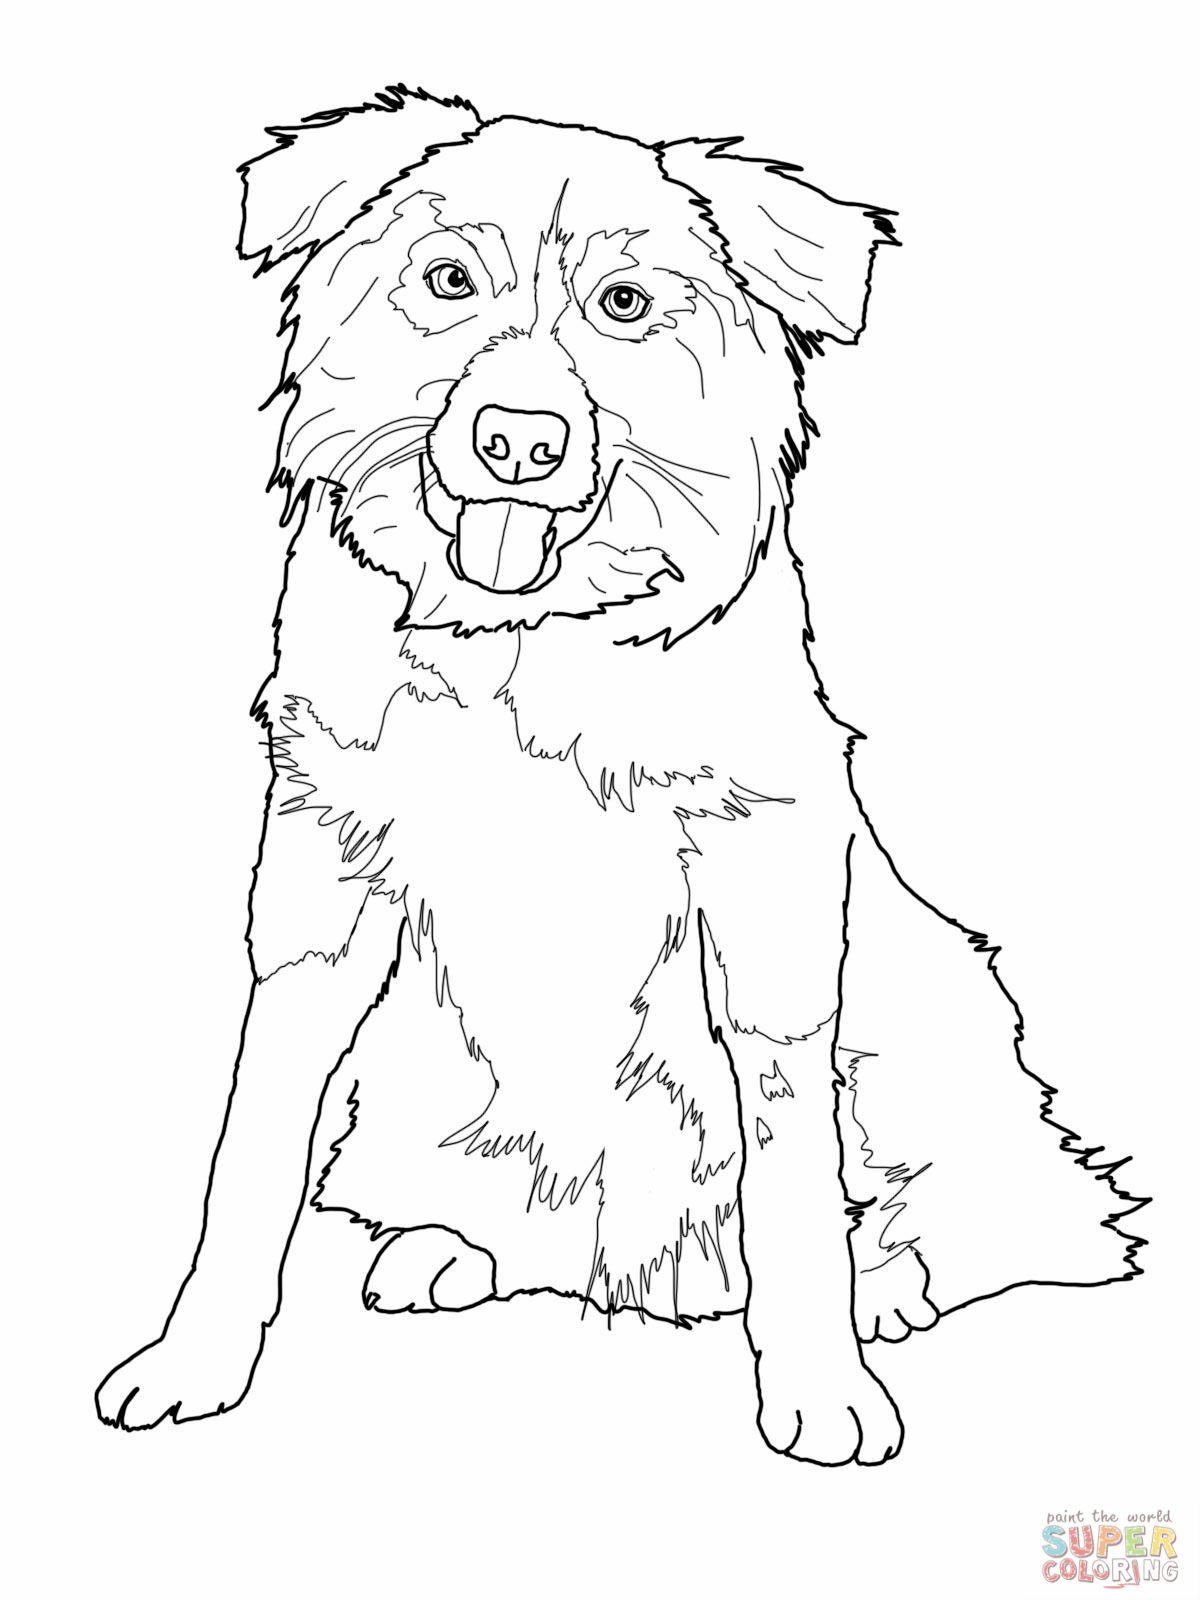 Free Stencil Dog Border Collie Border Collie Coloring Pages Dog Coloring Page Puppy Coloring Pages Dog Coloring Book